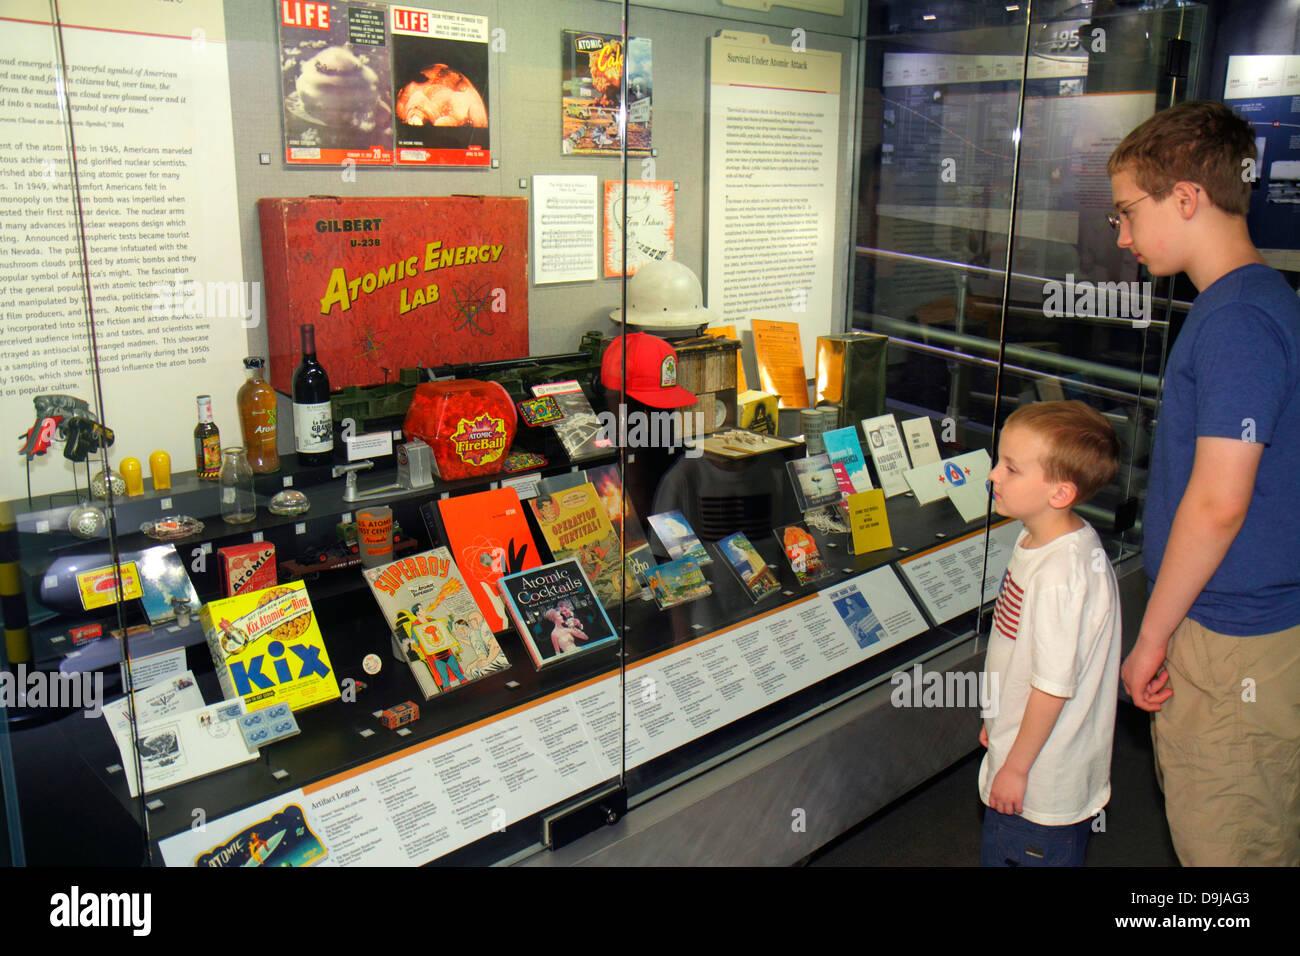 Nevada, West, Southwest, Las Vegas, Flamingo Road, National Atomic Testing Museum, nuclear weapons development, Area 51, relics, boy boys male kid kid Stock Photo